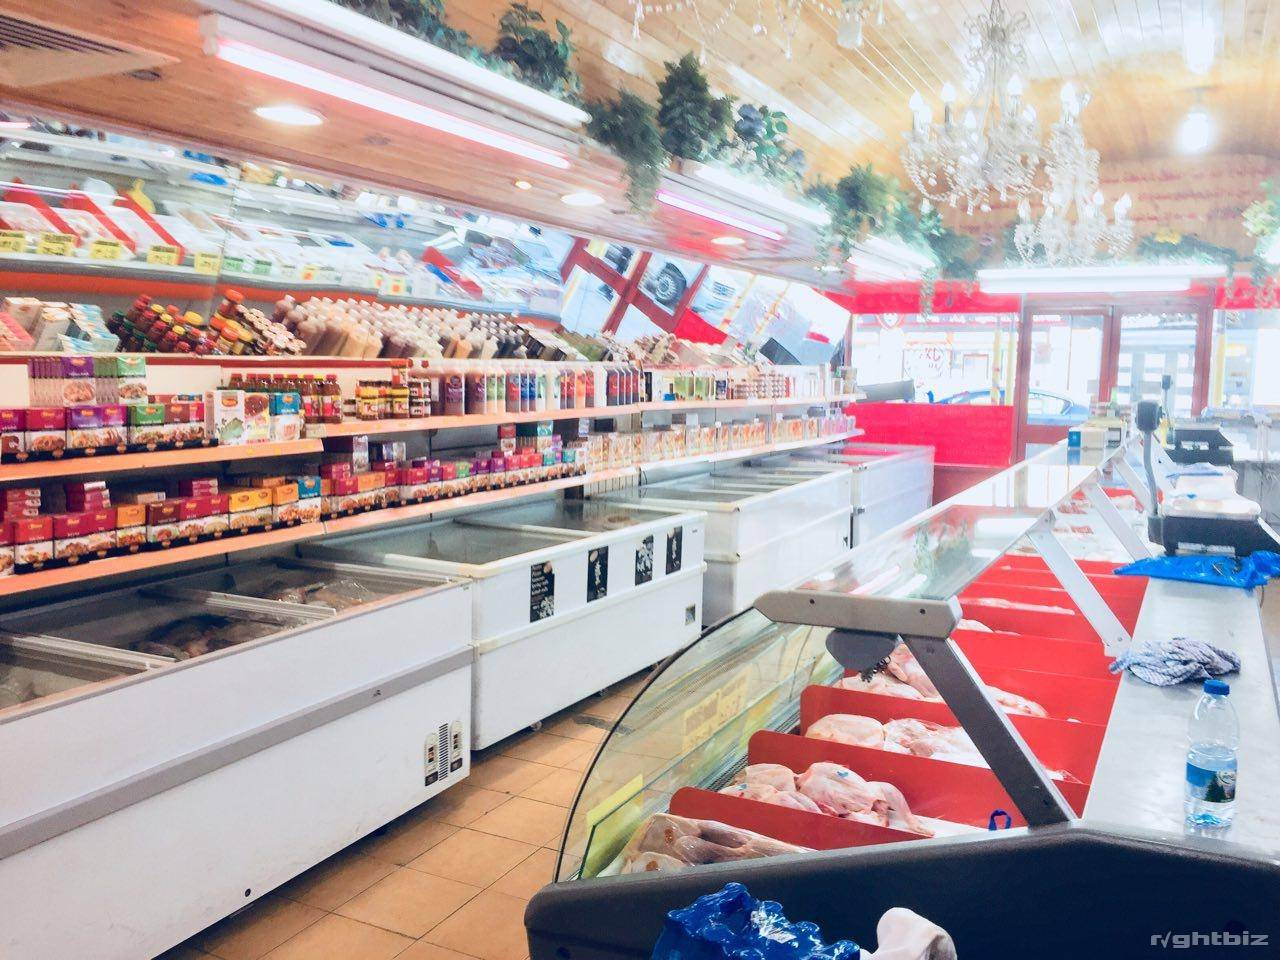 Halal Meat Shop Running Business For Sale - Image 5